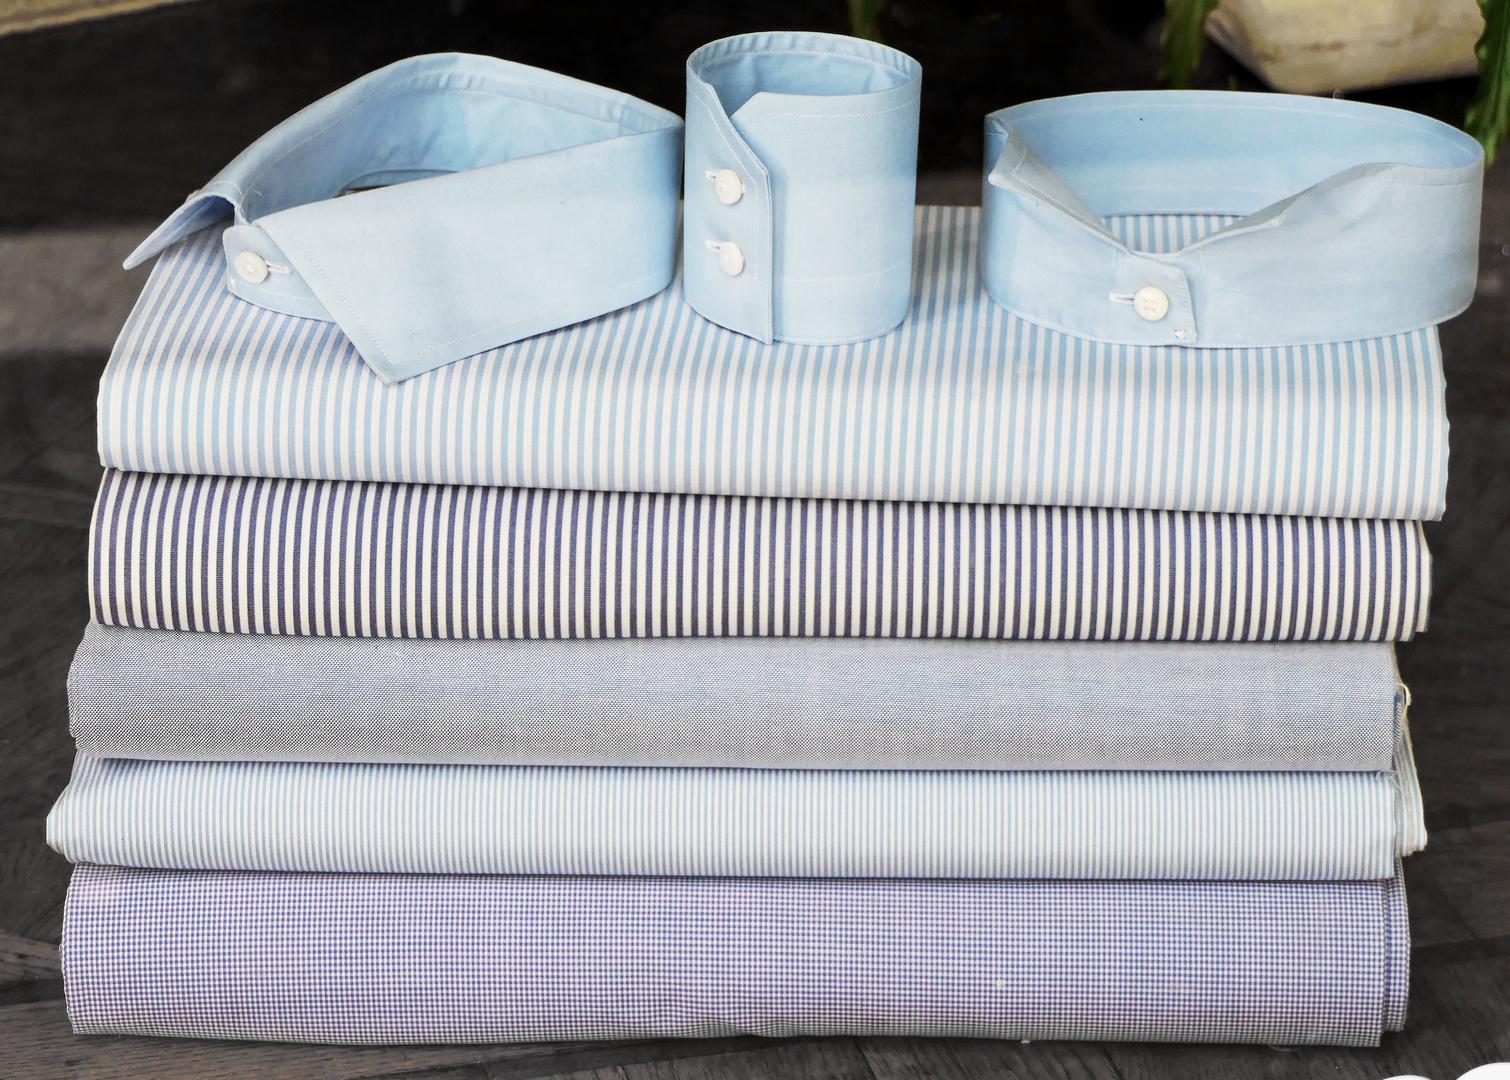 Les chemises